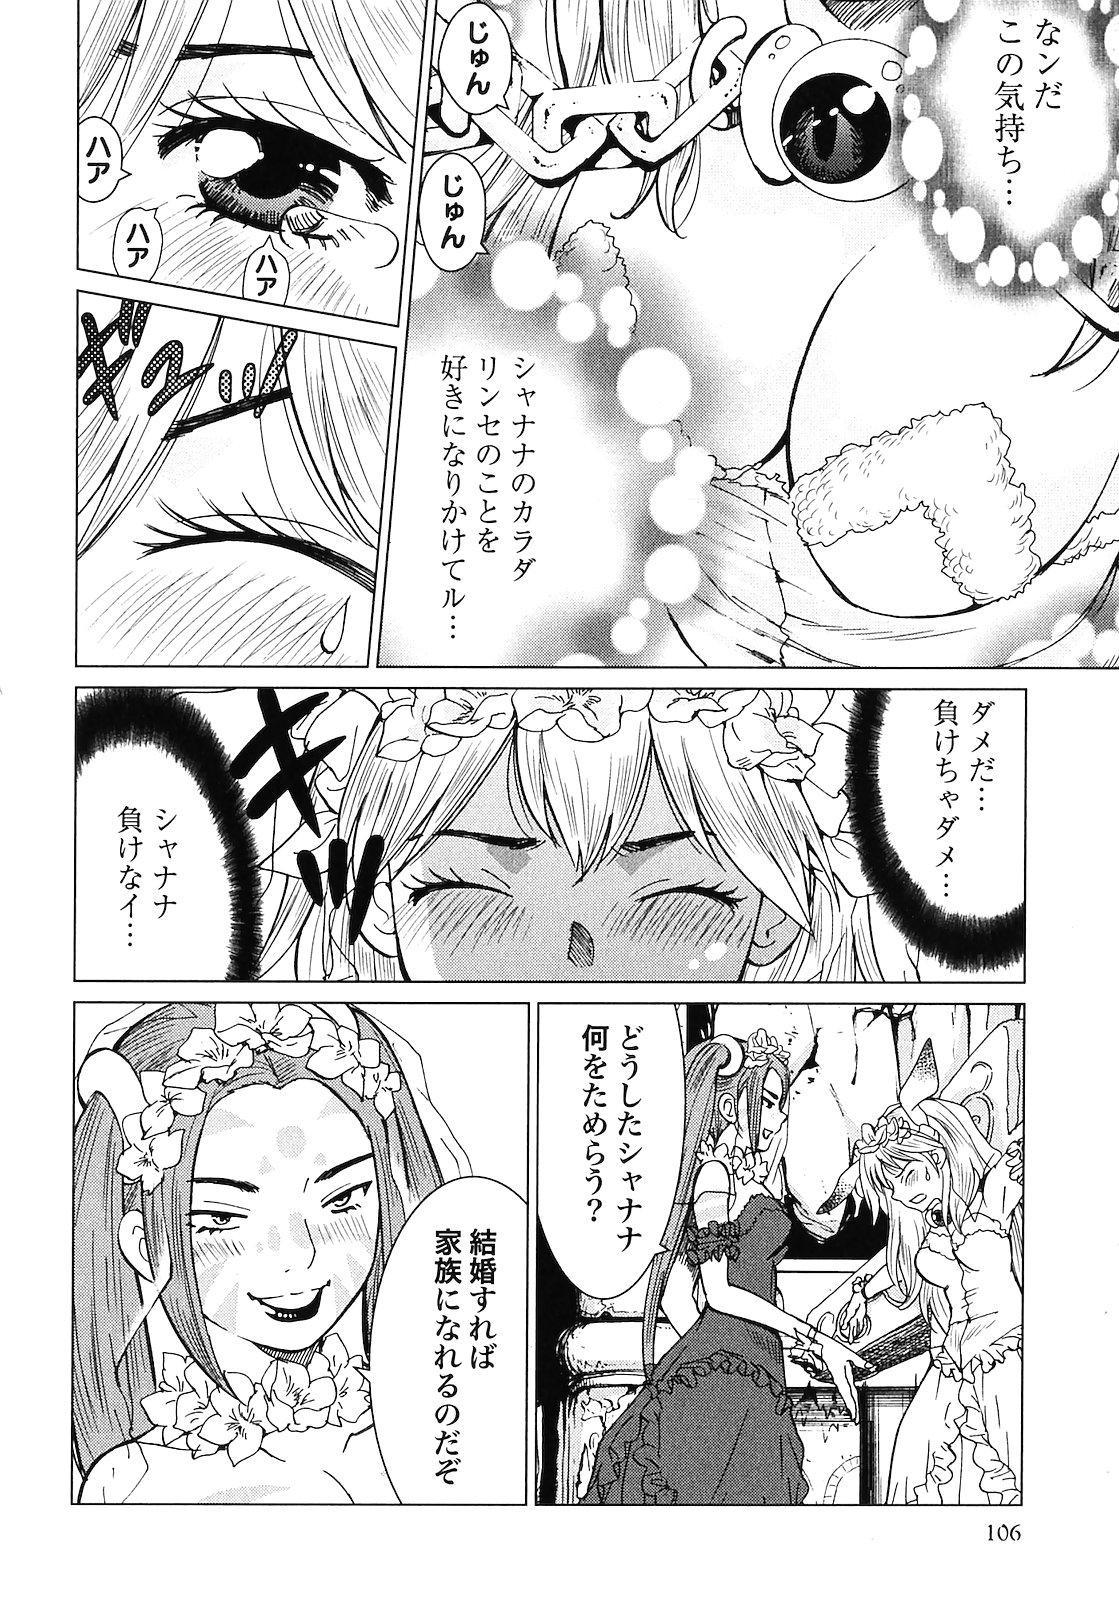 Makyo no Shanana Vol.02 107